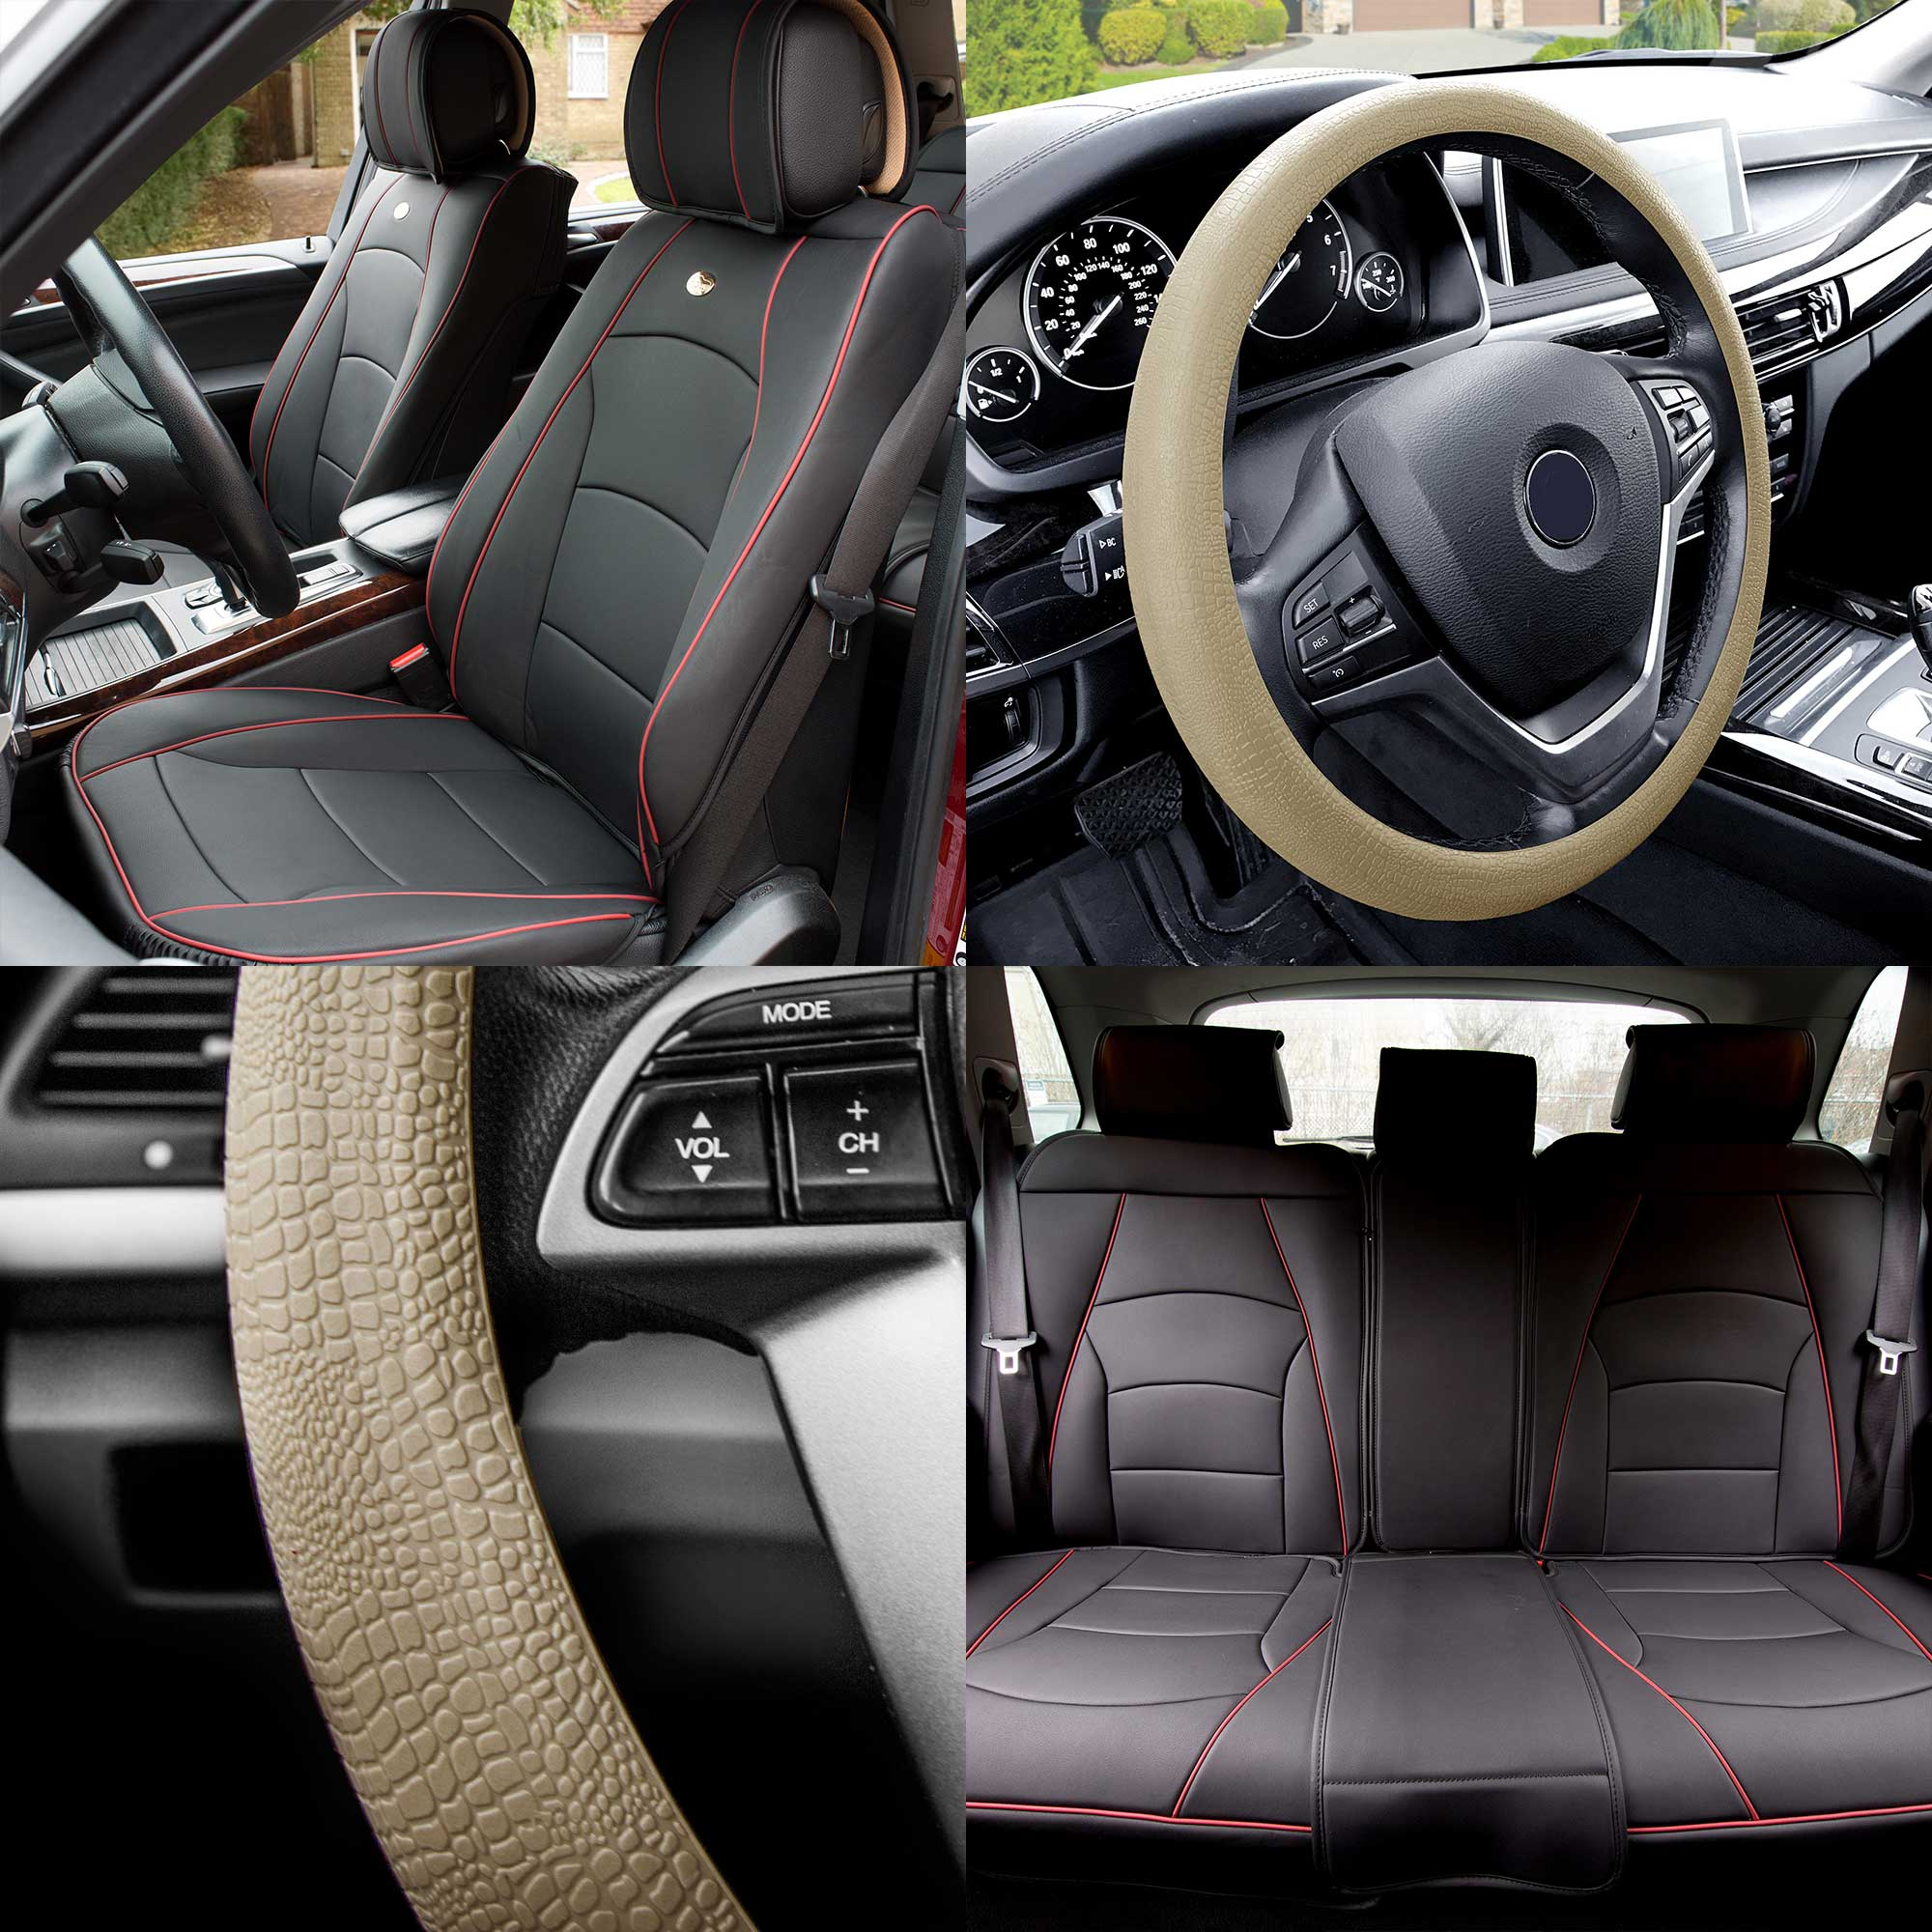 Car Seat Cover PU Leather 5 Seats Full Set Black Red w/ Beige ...